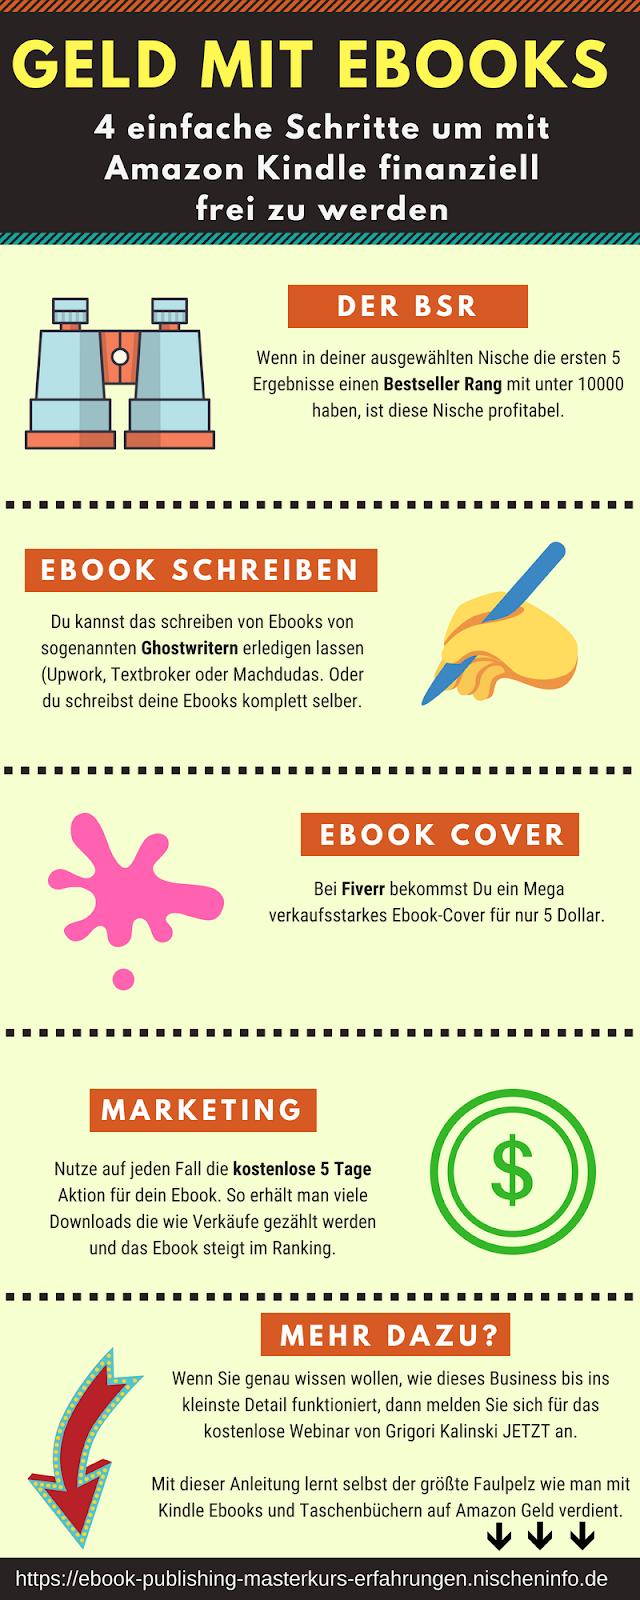 Ebook Publishing Masterkurs Erfahrungen